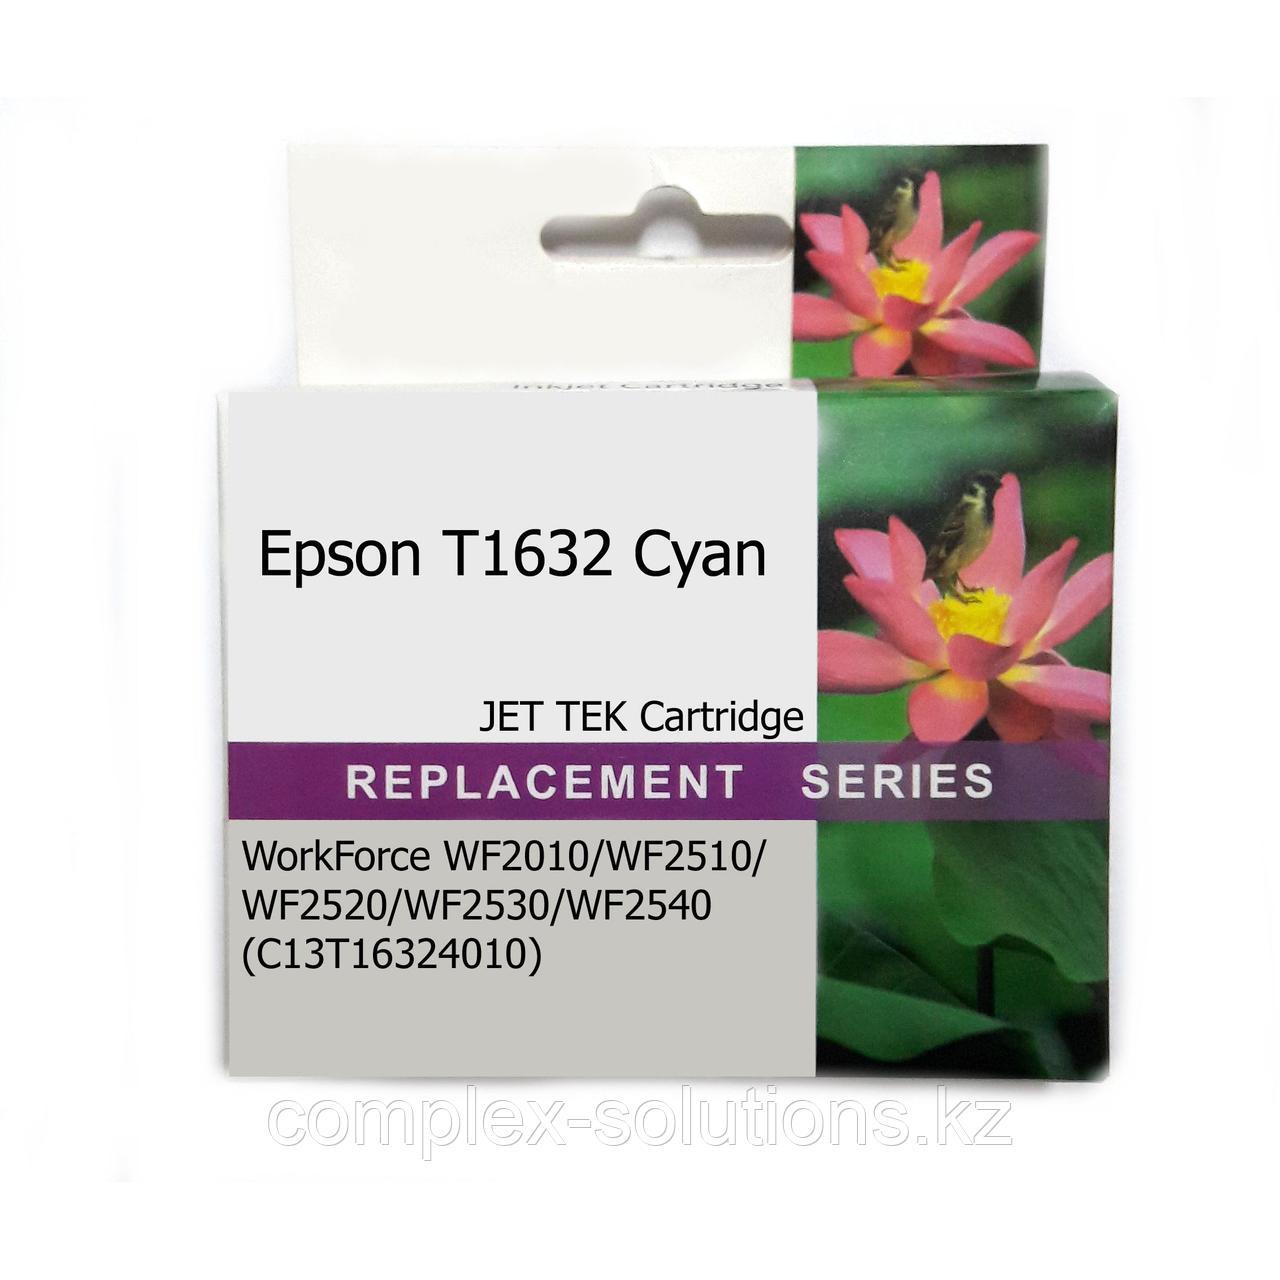 Картридж EPSON T1632 Cyan JET TEK | [качественный дубликат]